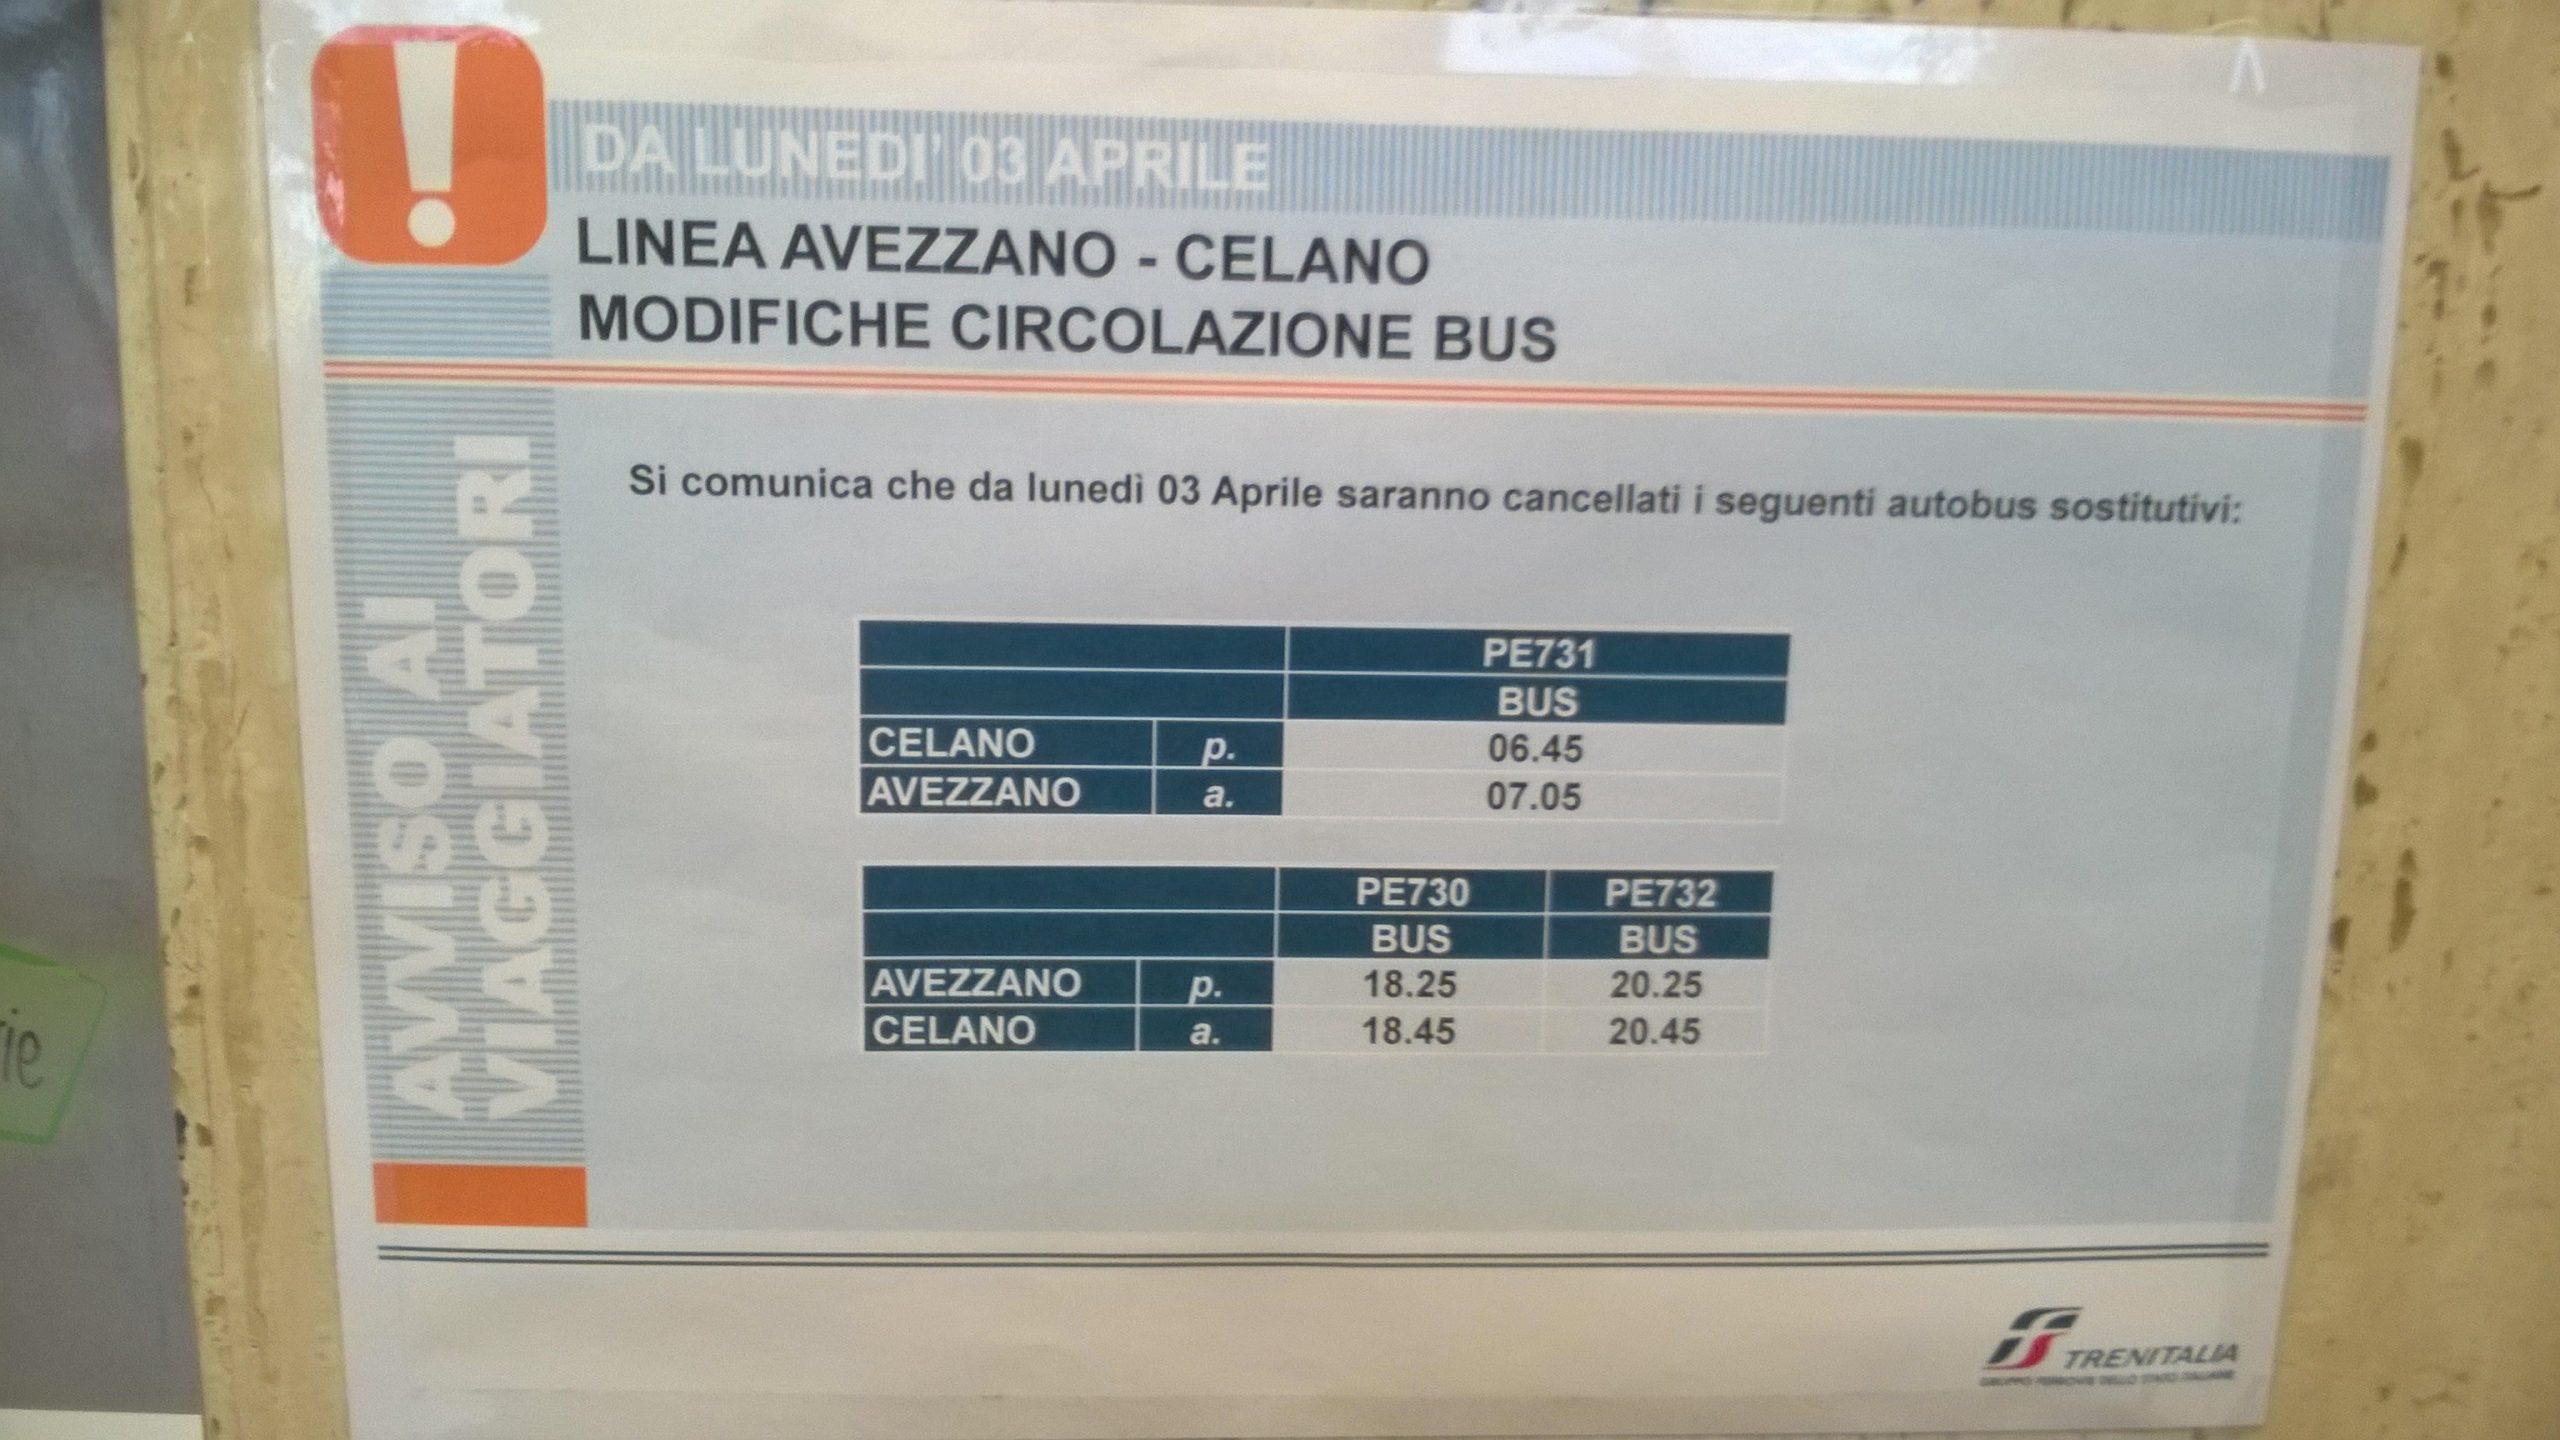 Disagi Trenitalia, i pendolari di Celano, Cerchio e Collarmele scrivono al sindaco Santilli